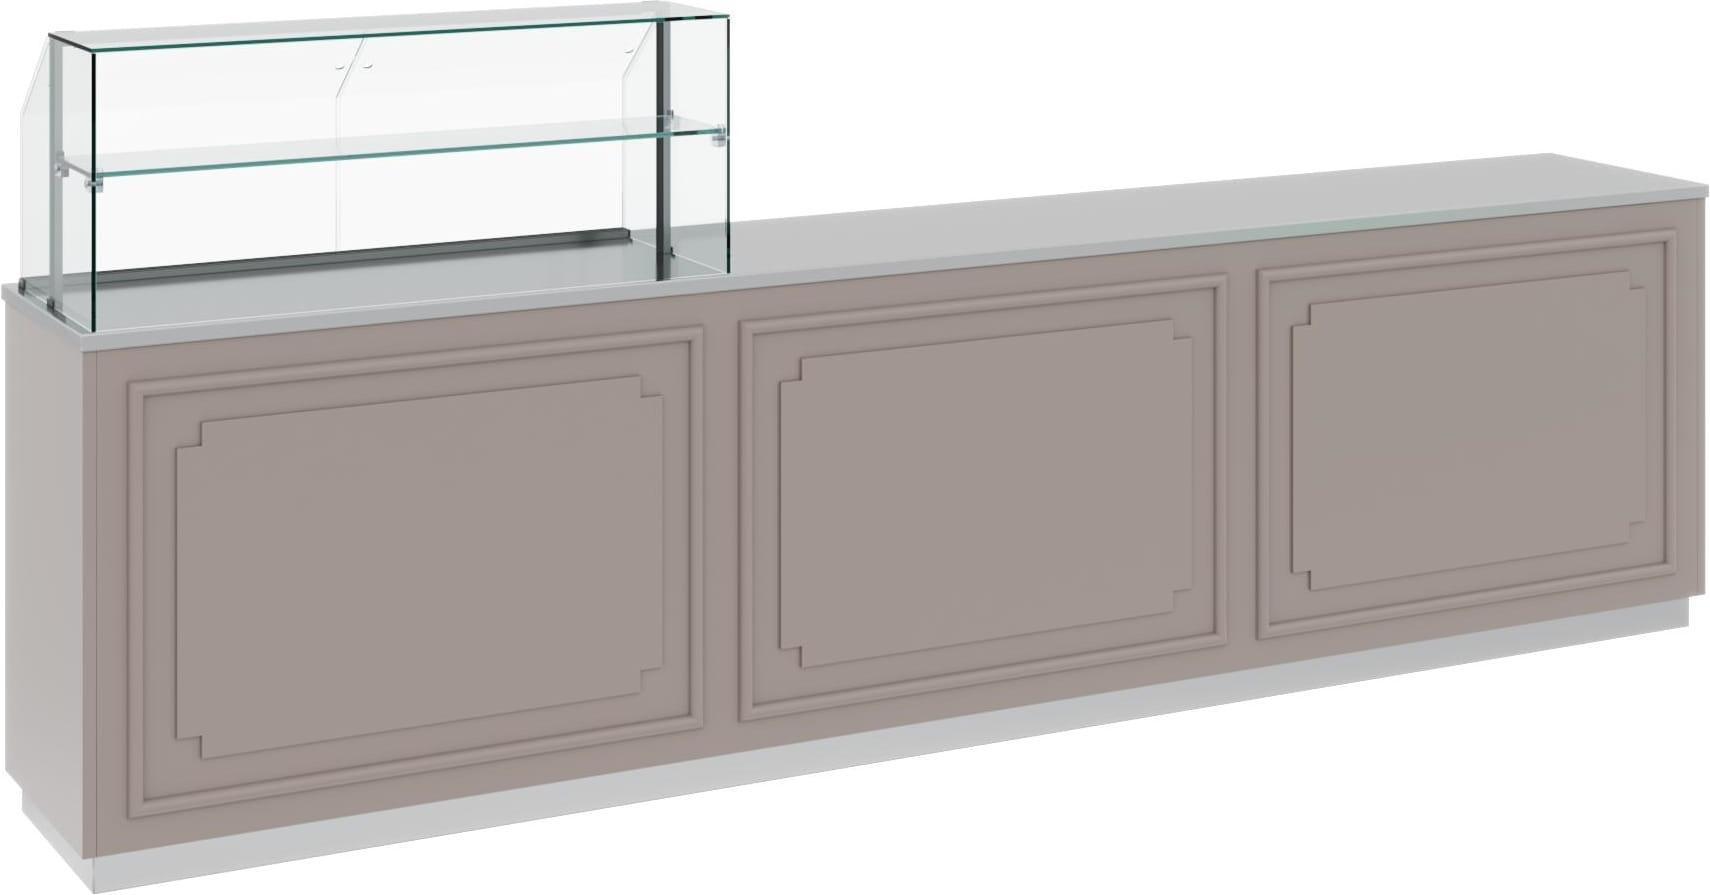 Нейтральная витрина CARBOMA OMI AC40N 1.5-11 - 1